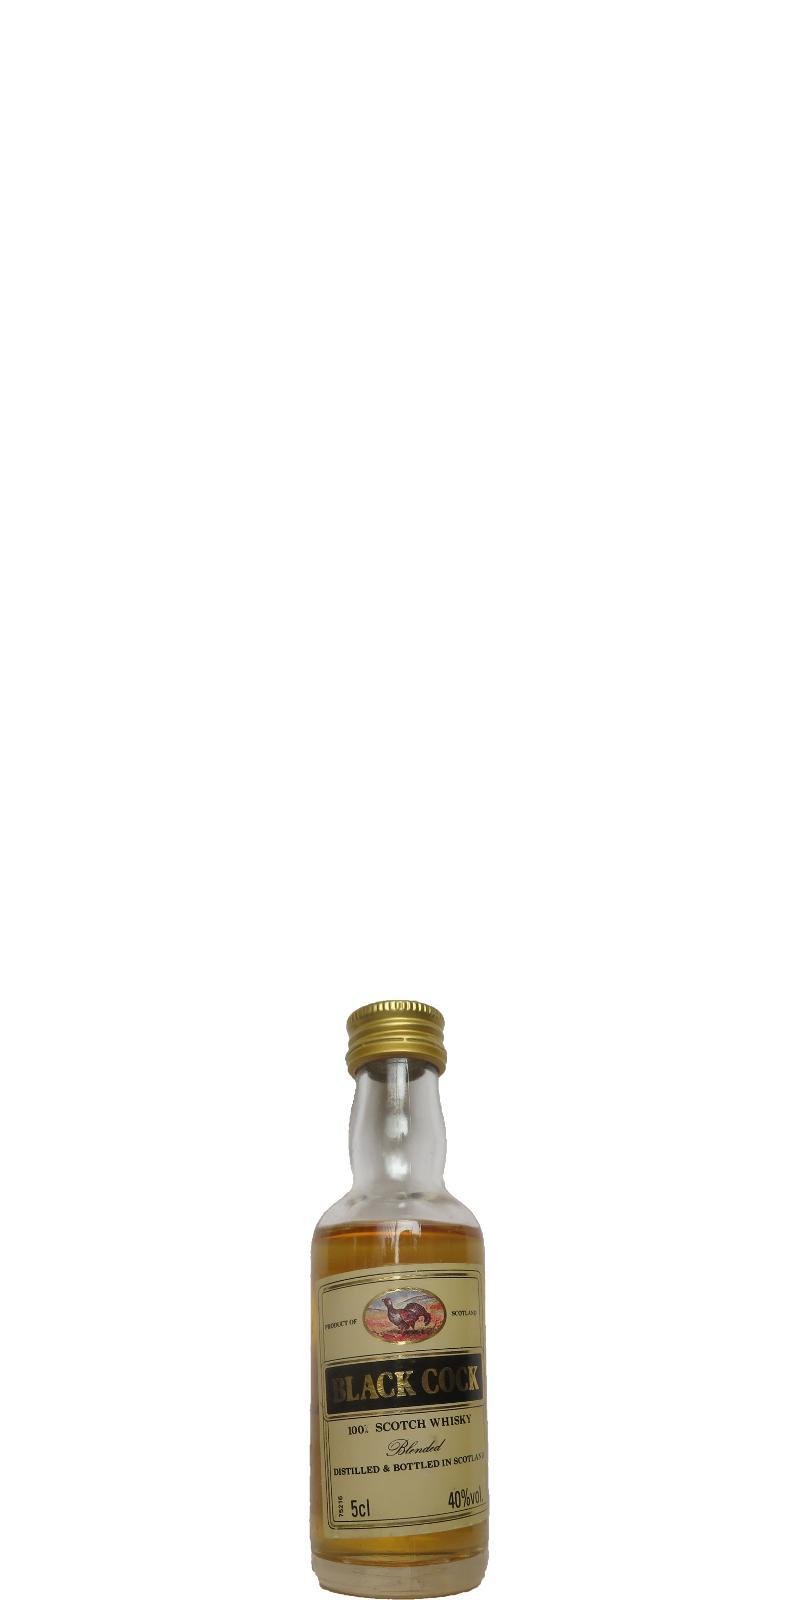 Black Cock 100% Scotch Whisky